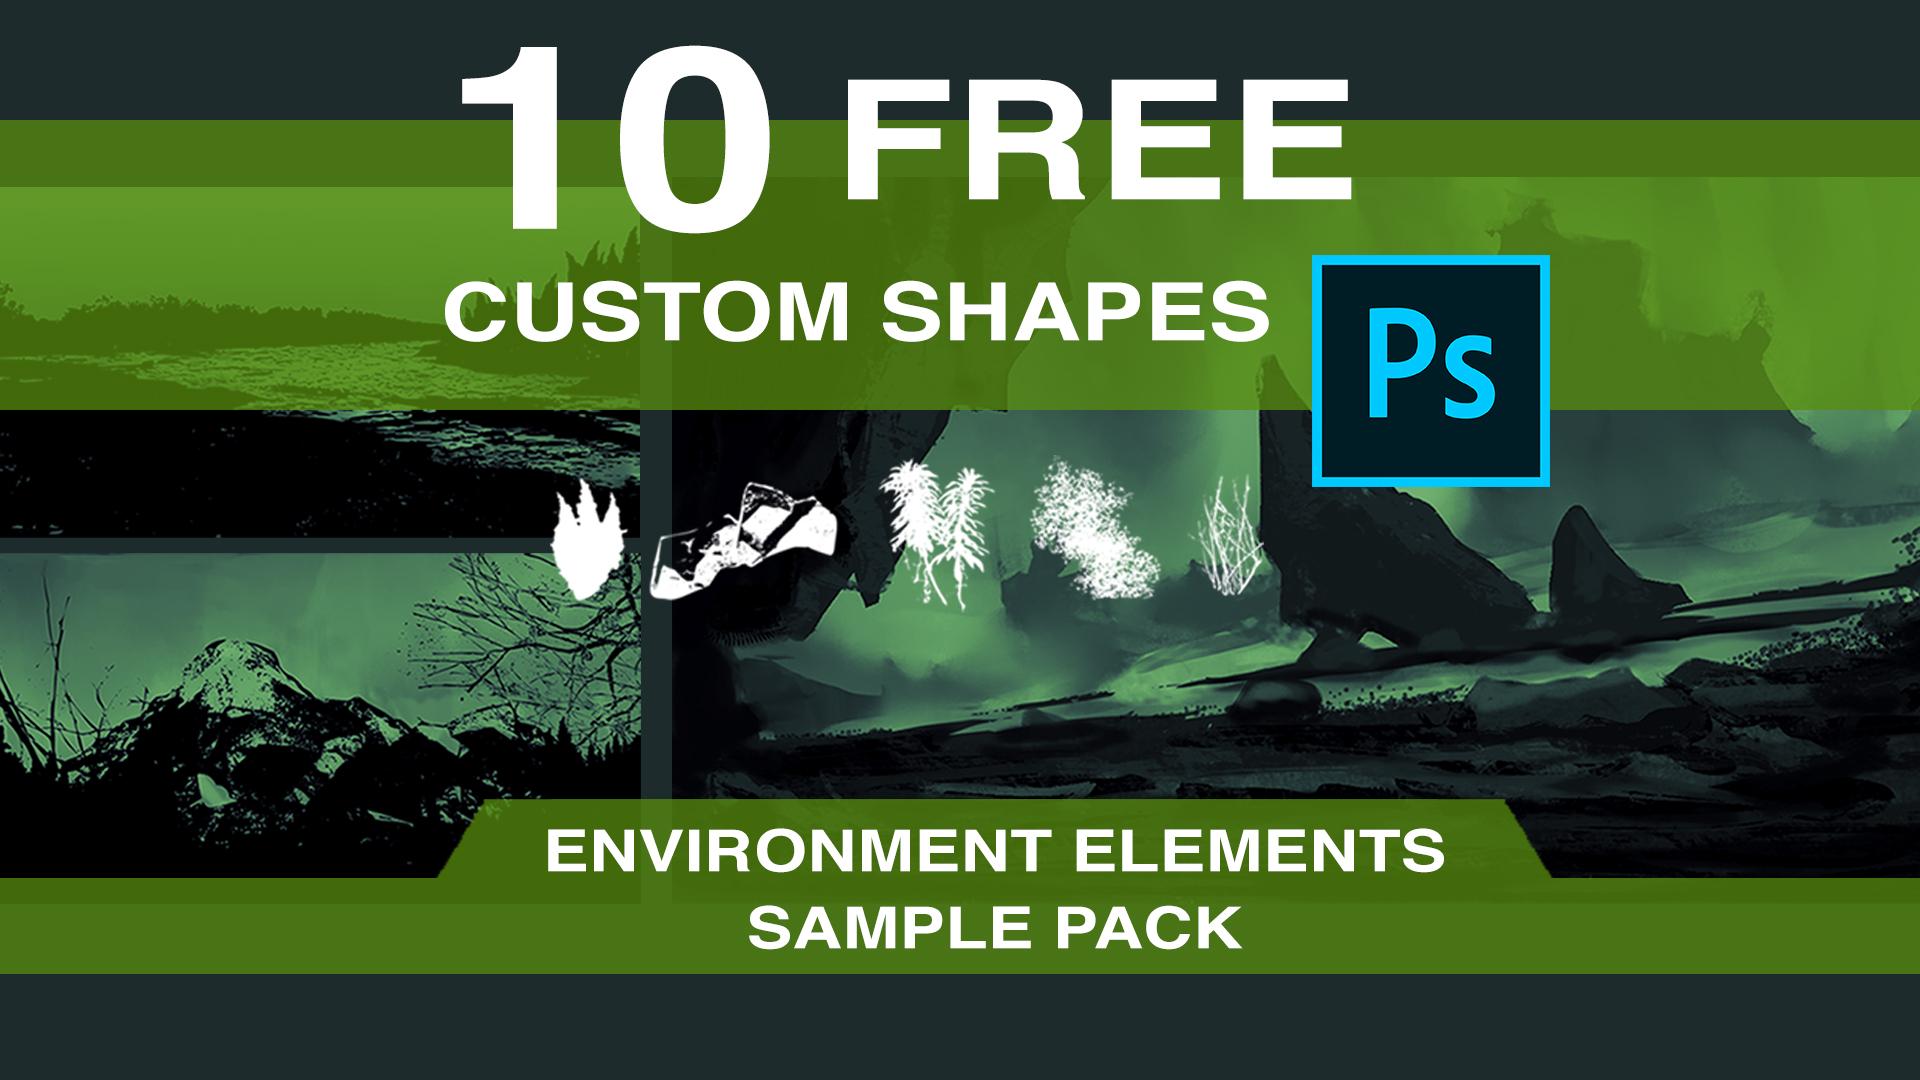 BD_10-FREE_CustomShapes_ENV-Pack_THUMB.jpg